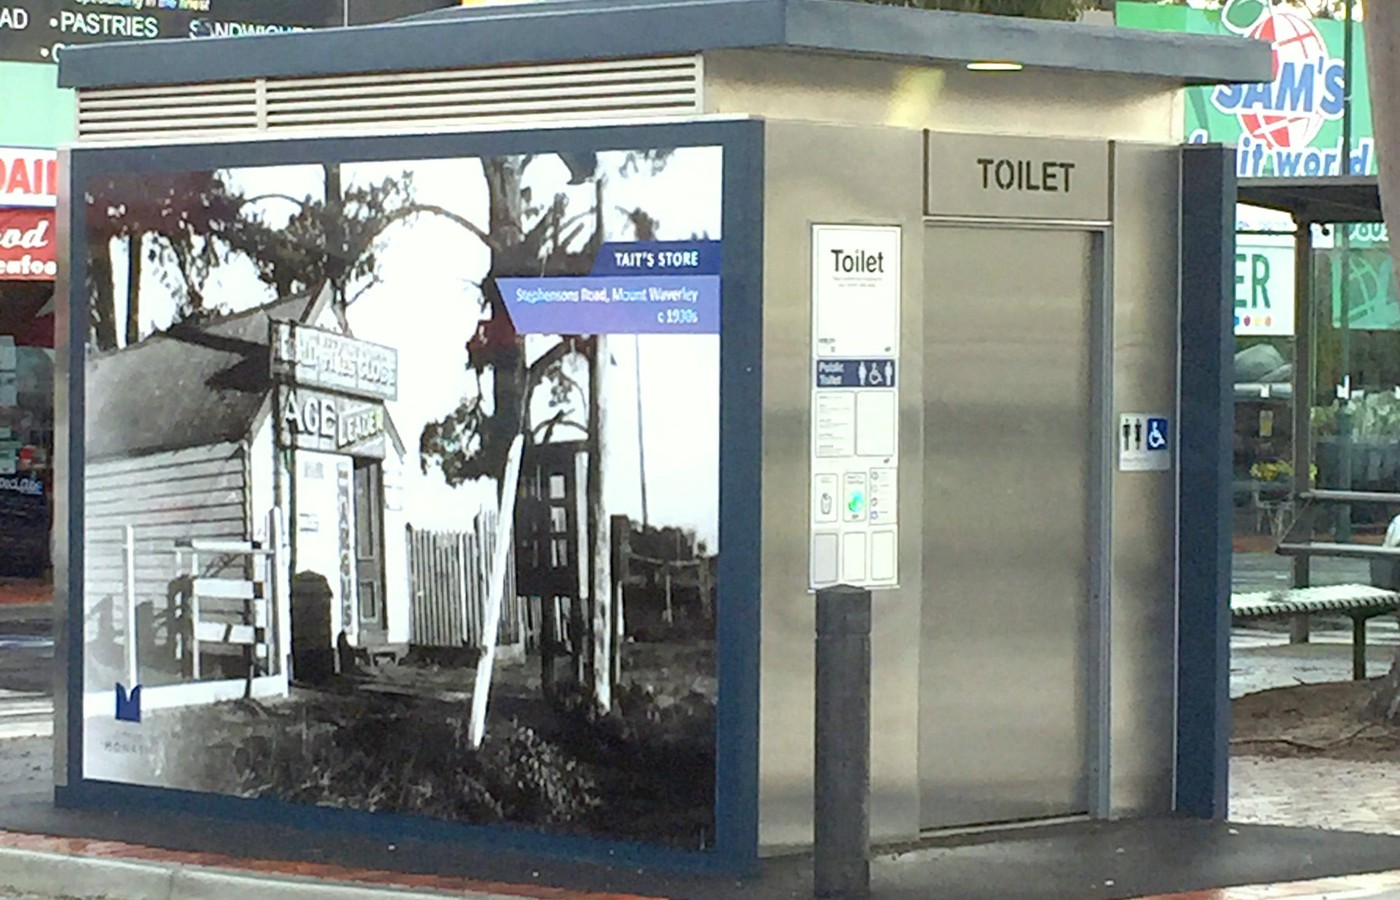 Exeloo Public Toilets Exeloo Public Toilets